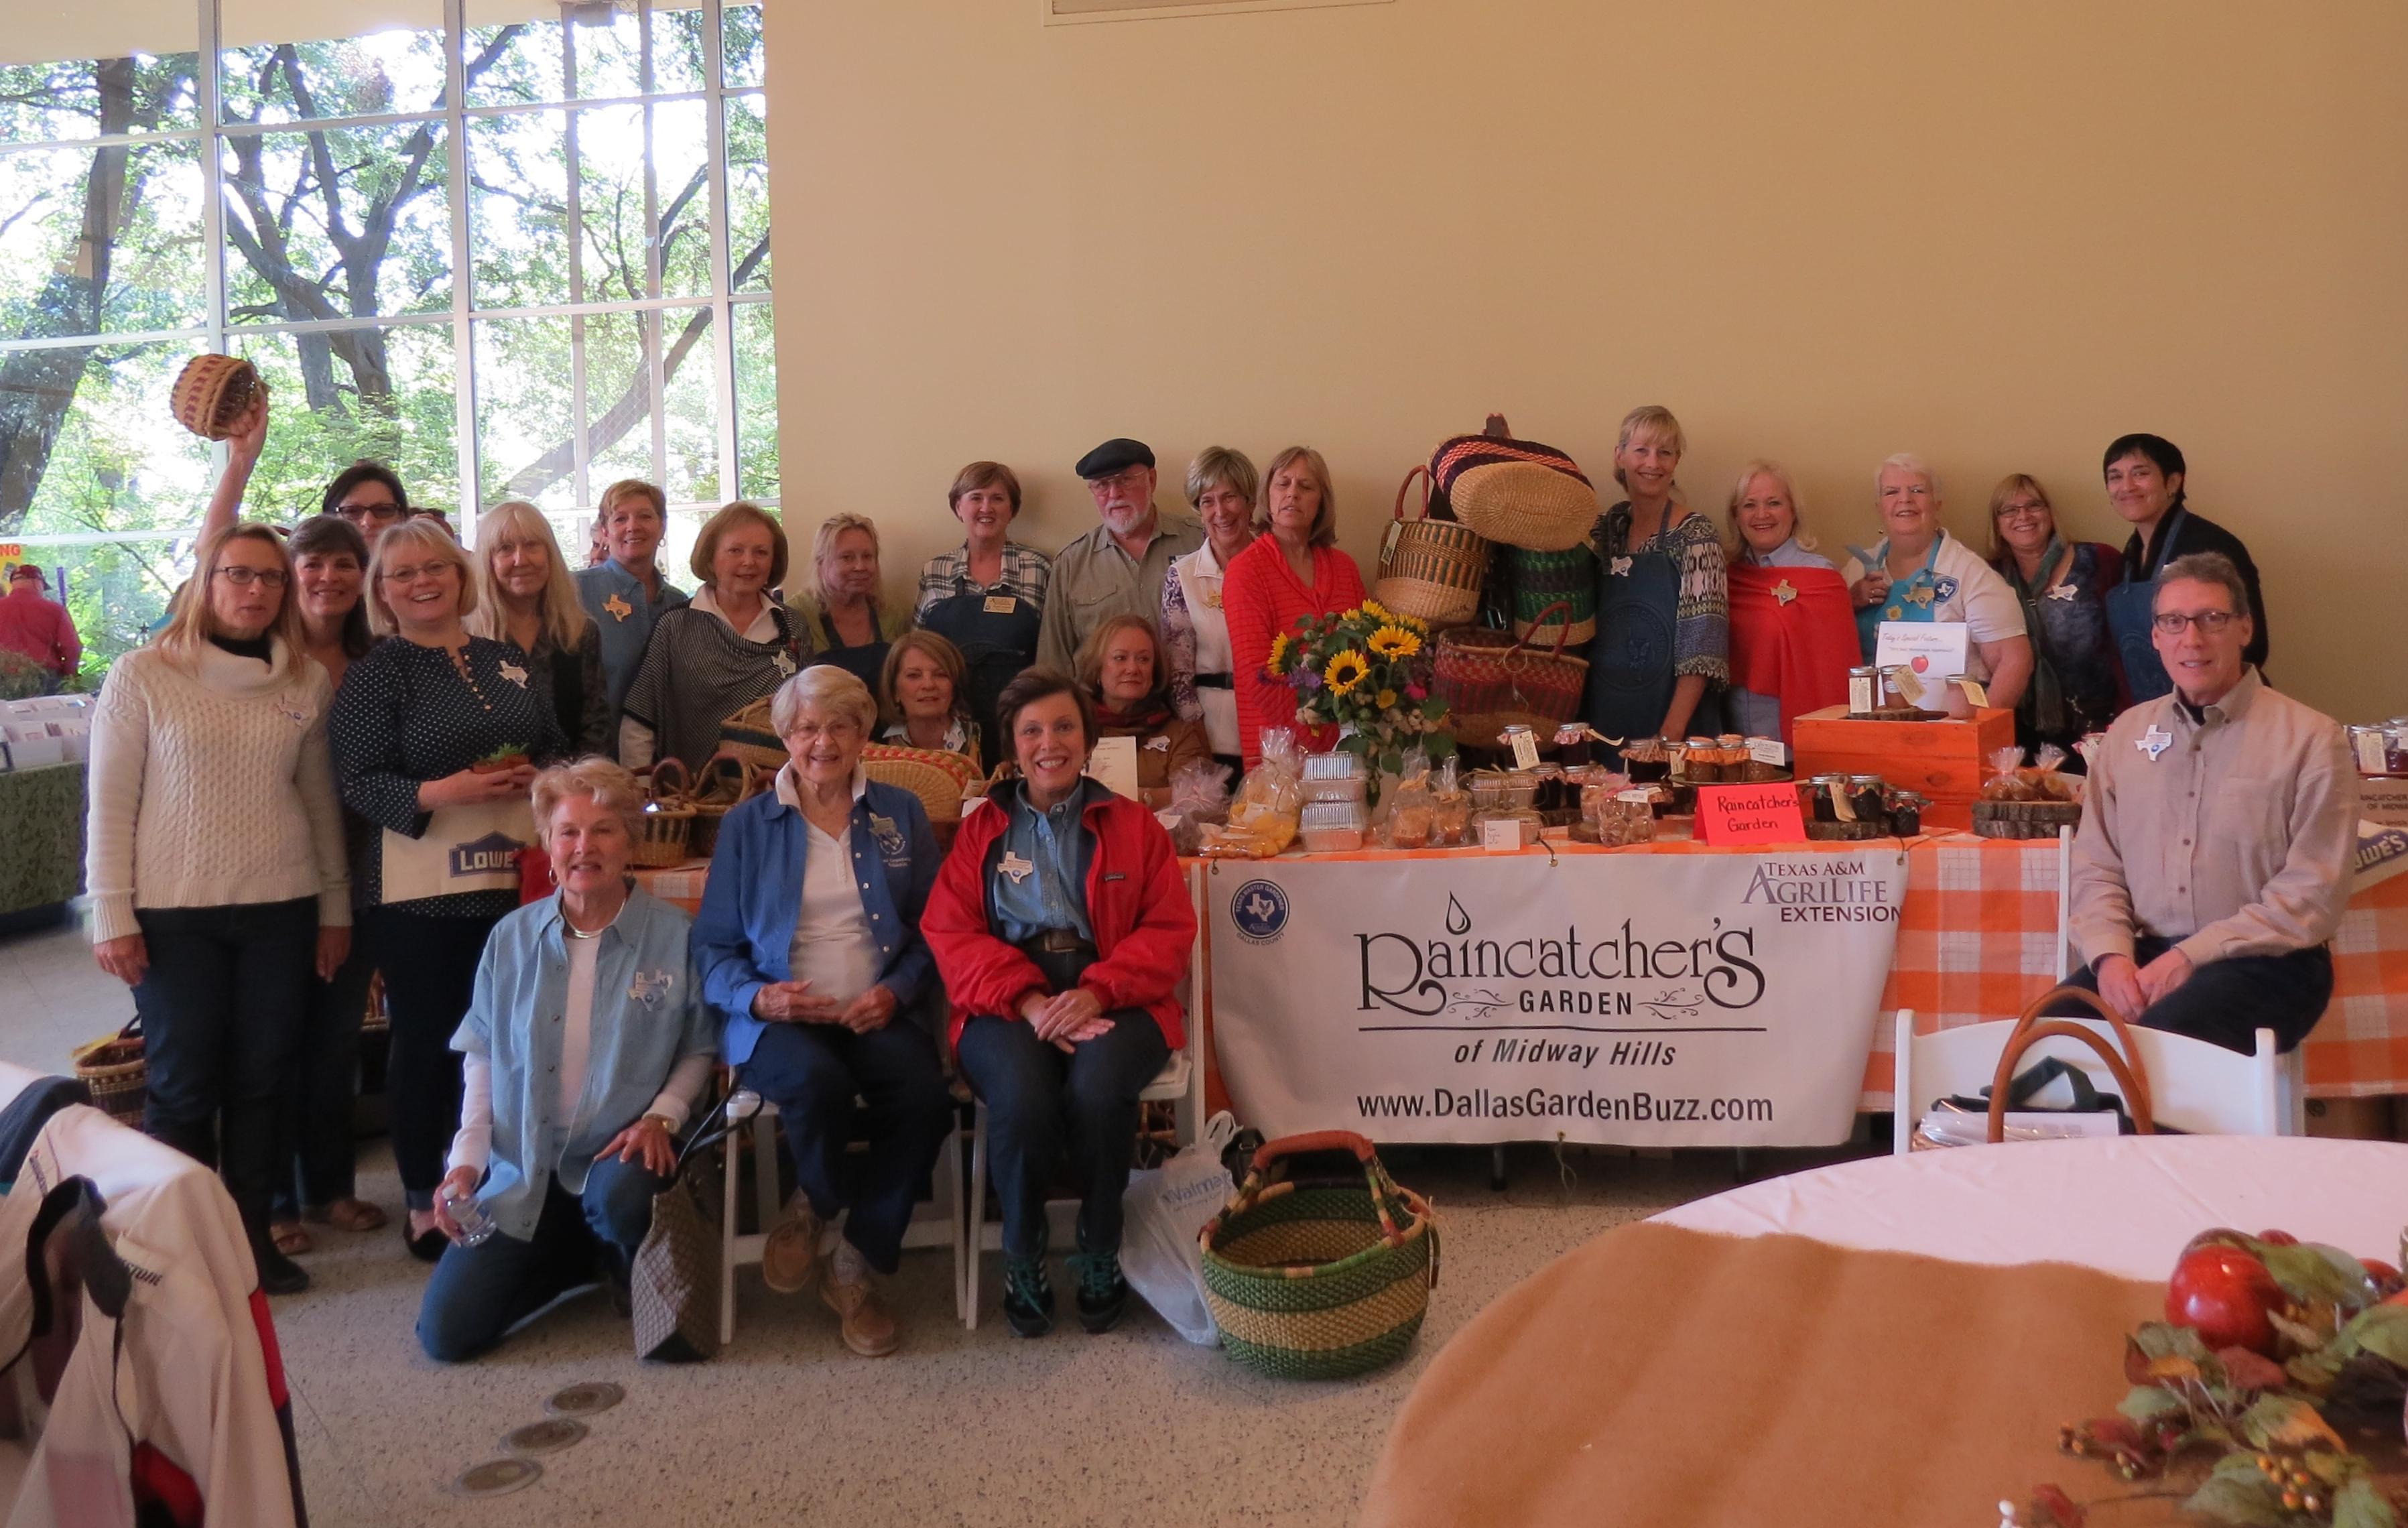 Dallas County Master Gardeners from The Raincatcher's Garden at the Craft Fair